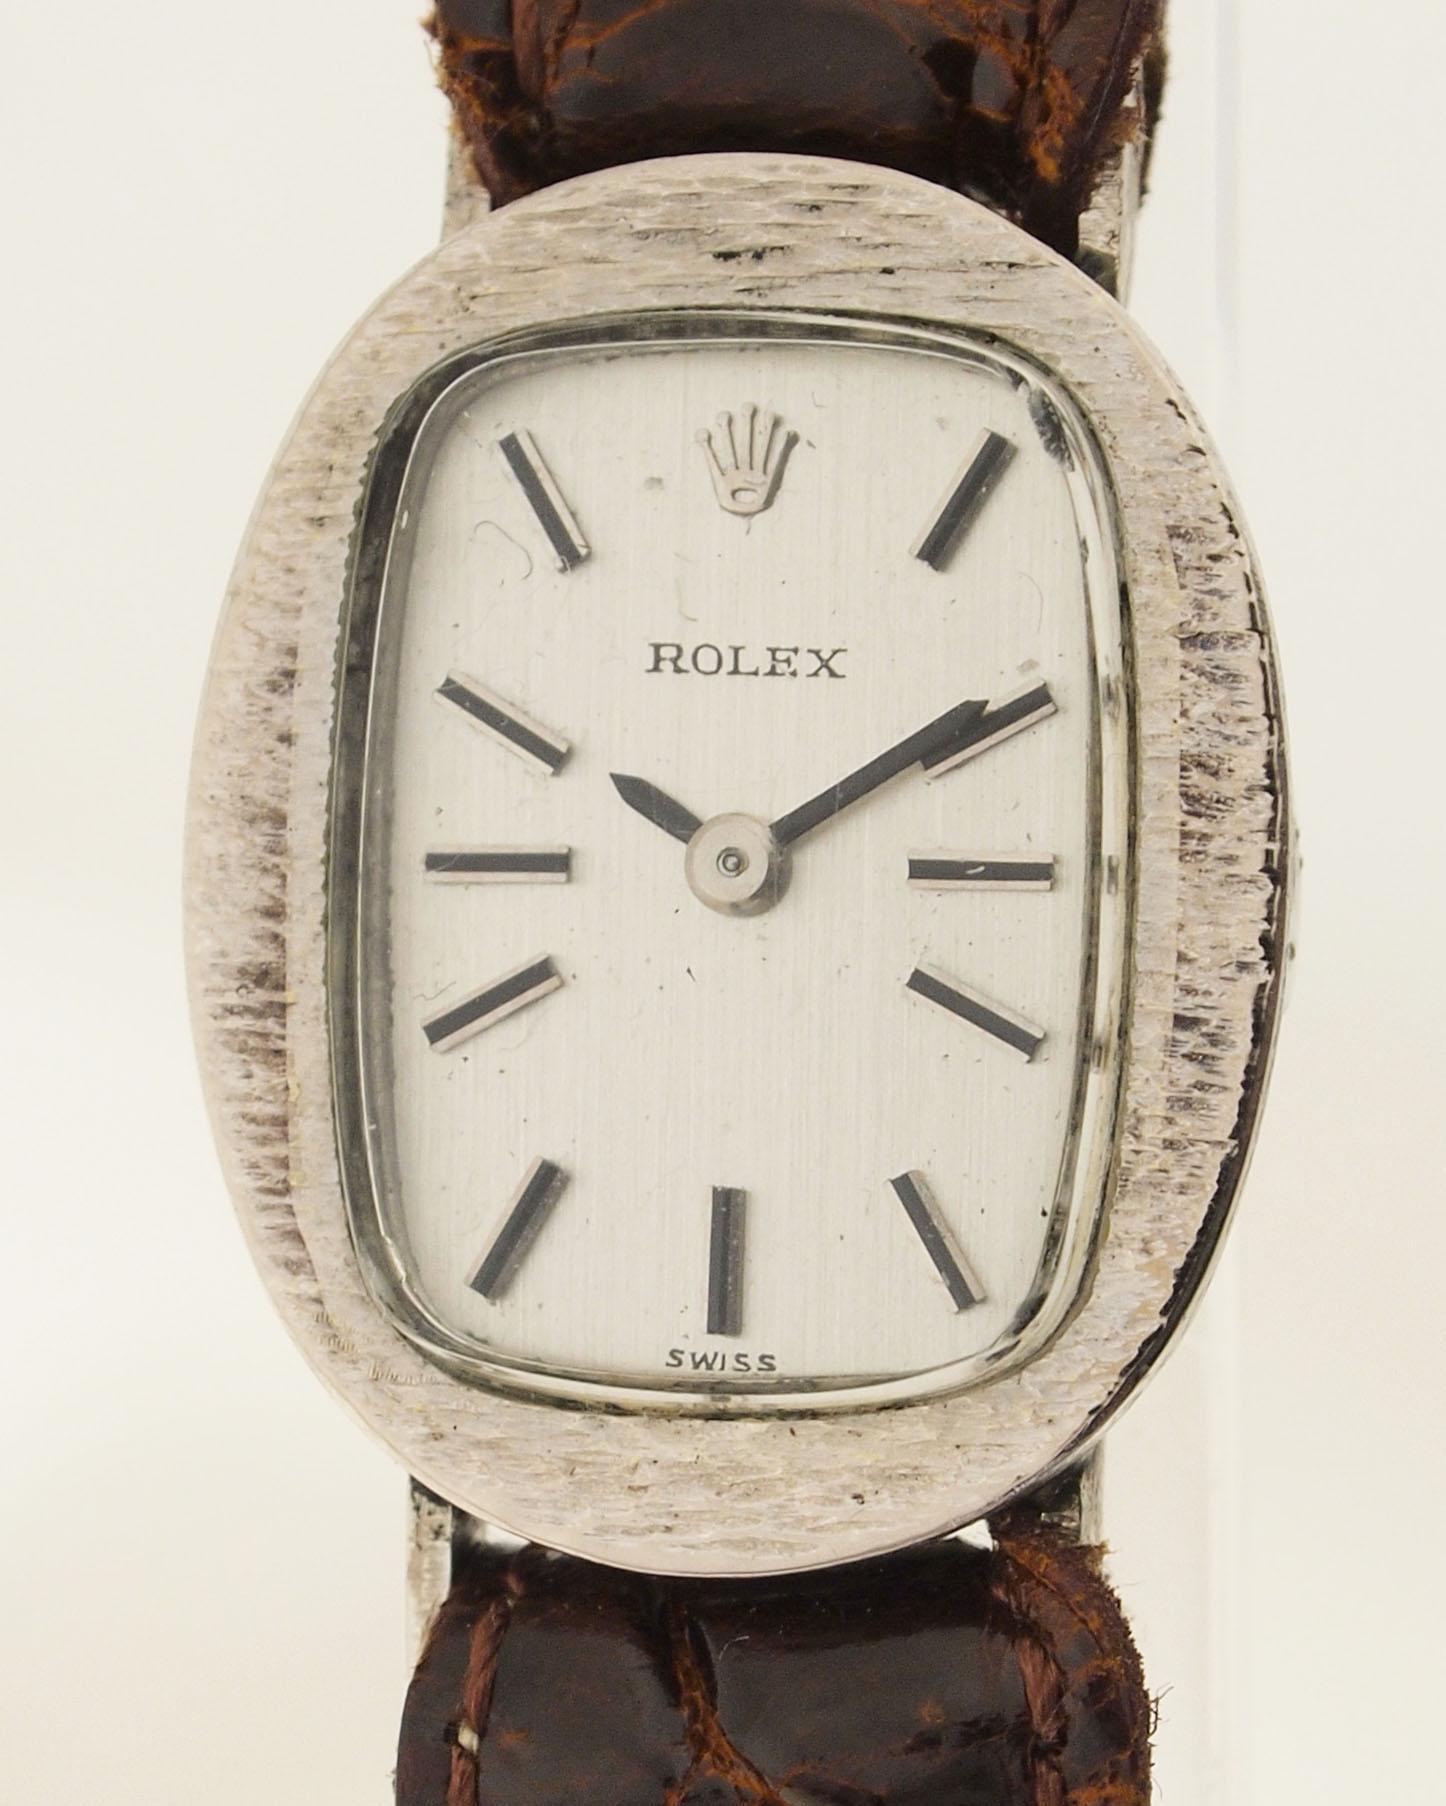 rolex damen armbanduhr in 18ct weissgold 1960er jahre kaliber 1400 ebay. Black Bedroom Furniture Sets. Home Design Ideas